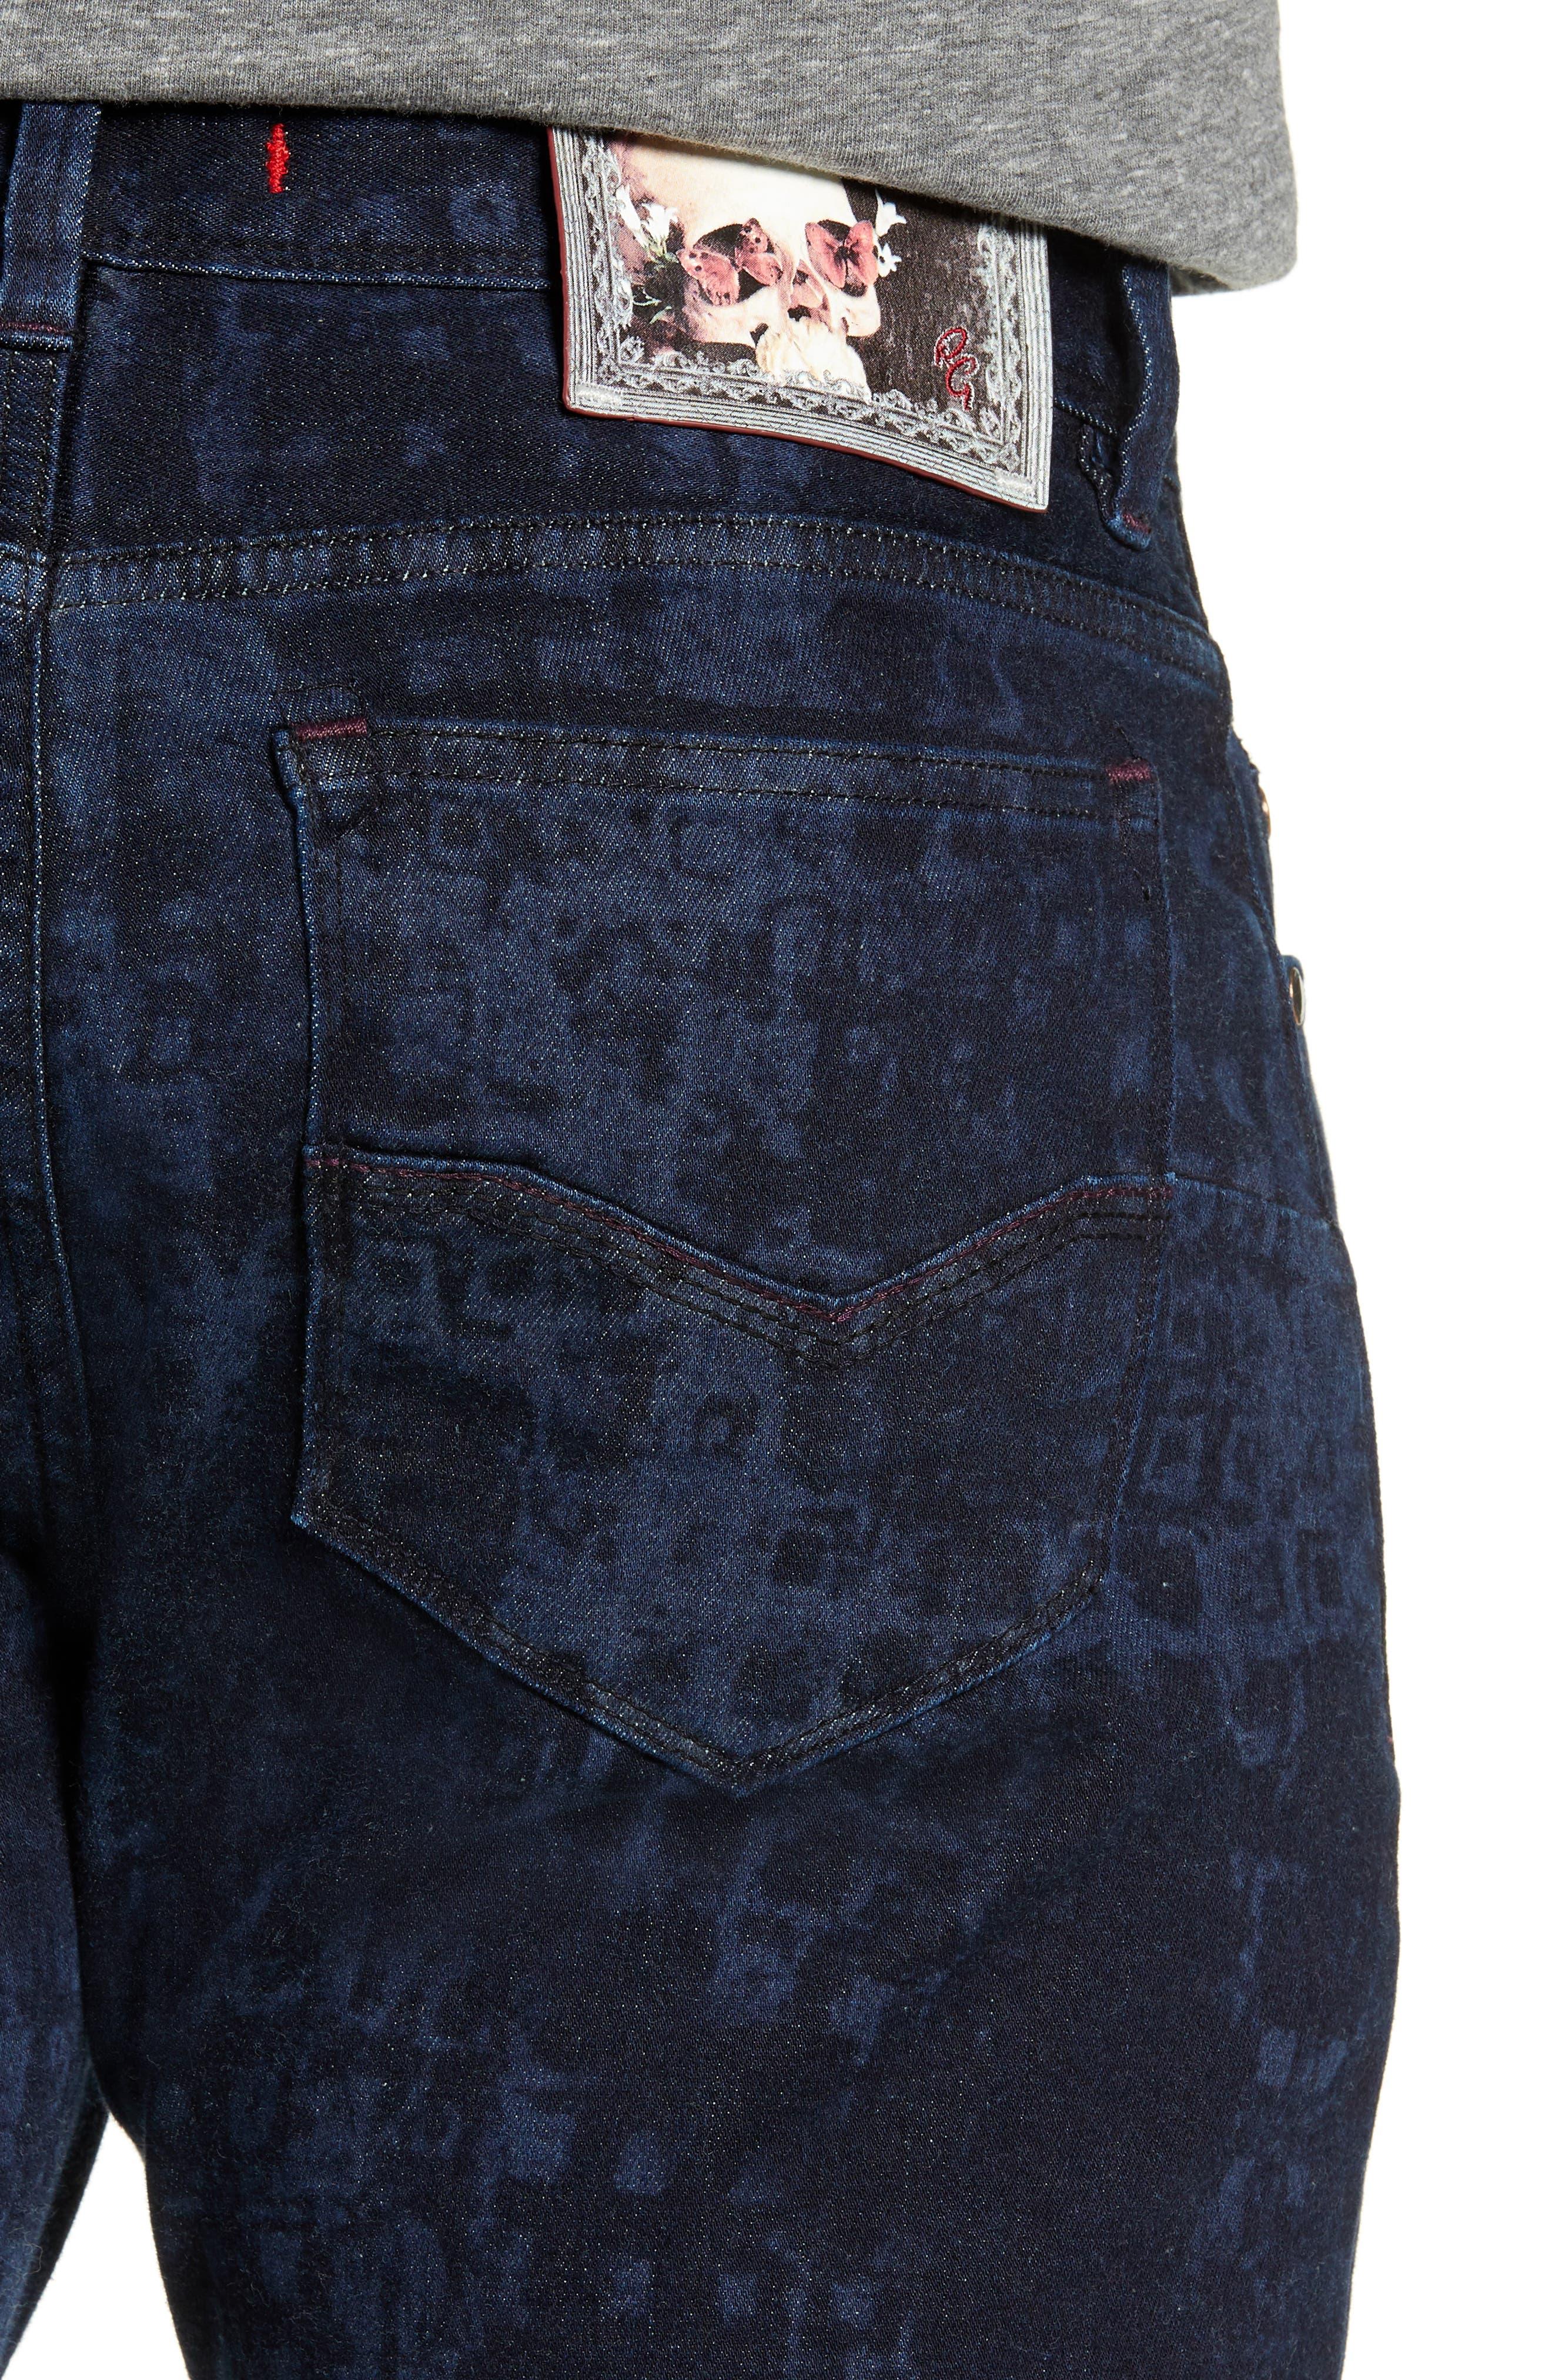 Chilcott Classic Fit Jeans,                             Alternate thumbnail 4, color,                             INDIGO